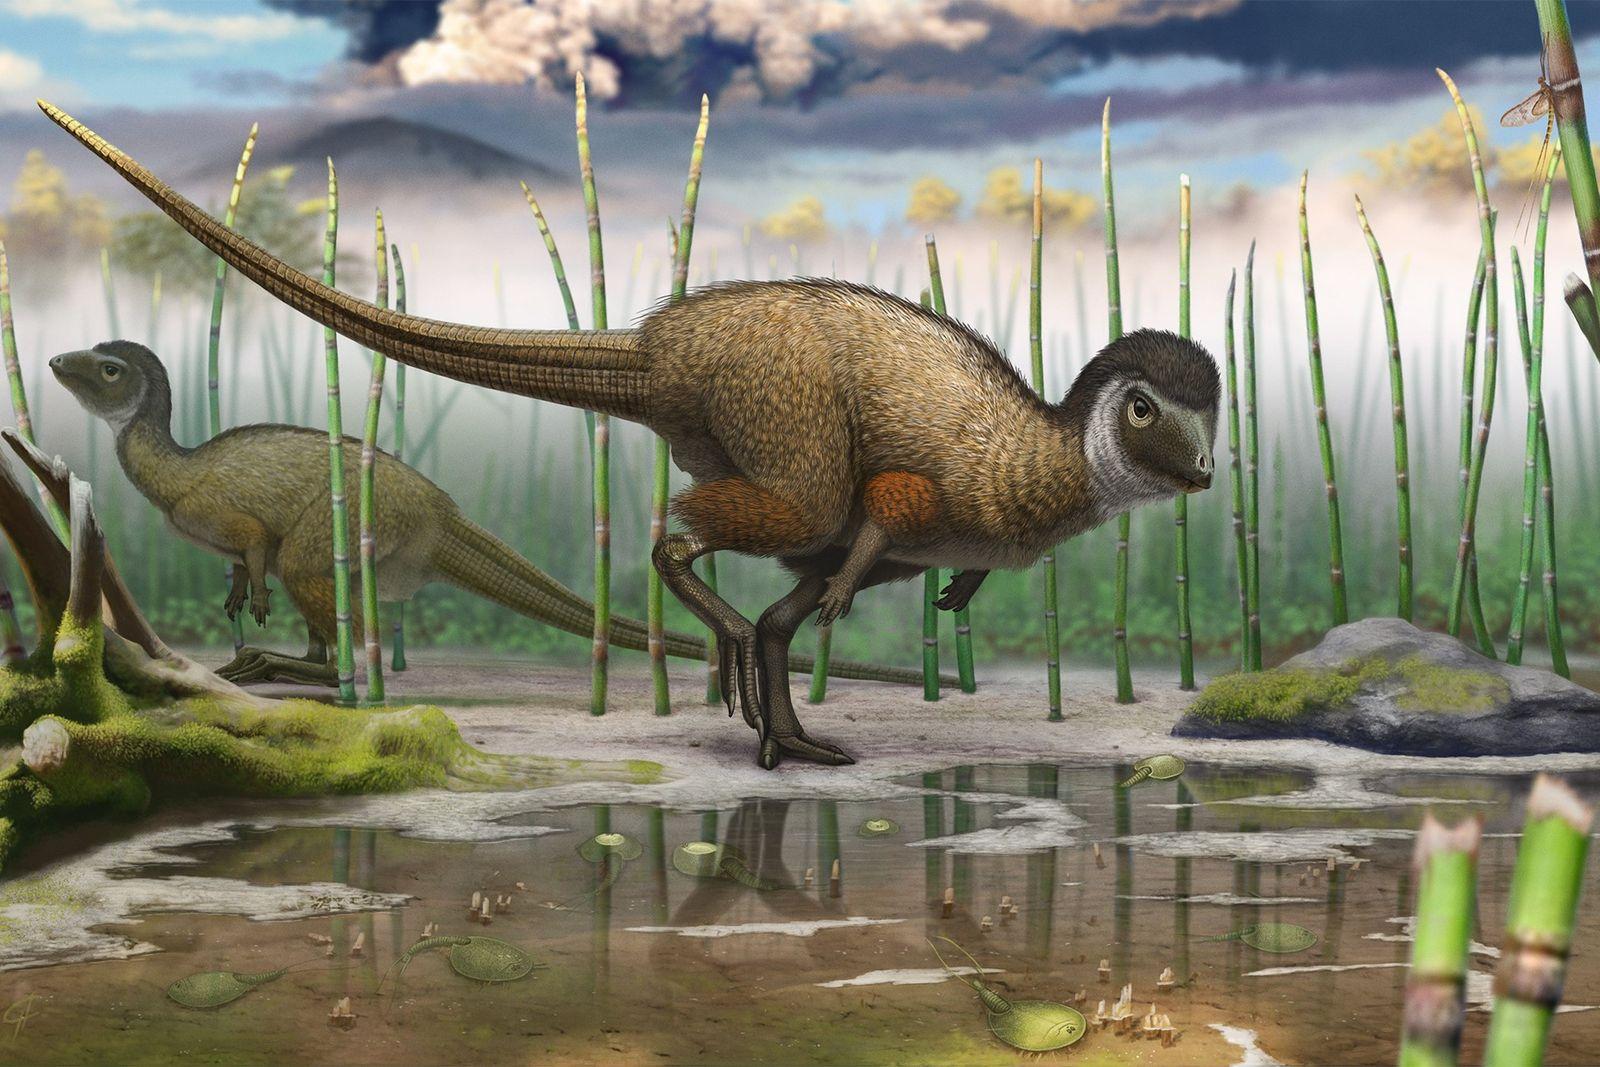 Kulindadromeus feathered dinosaur 01